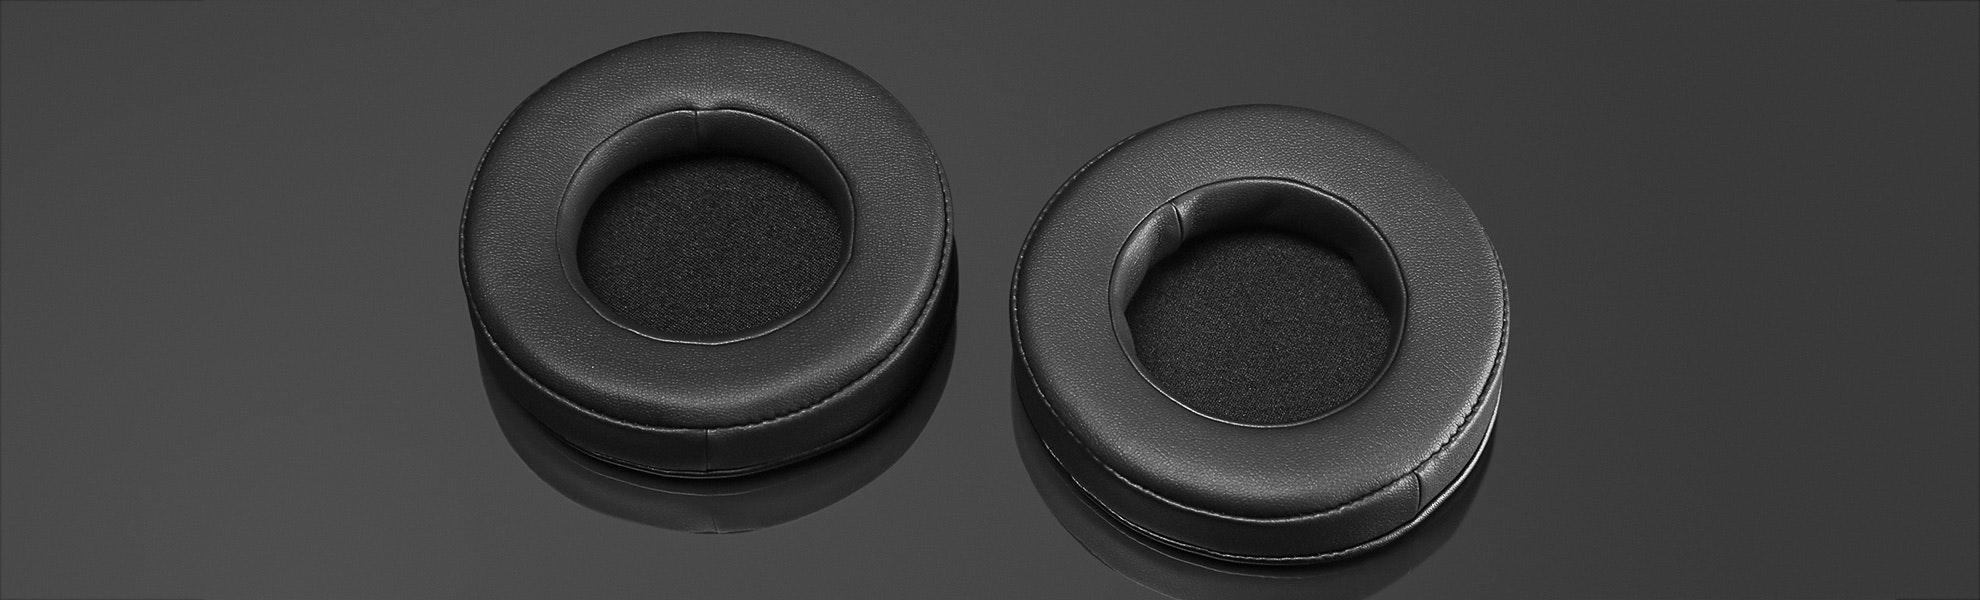 Dekoni Premium Ear Pads for Beyerdynamic DT/T